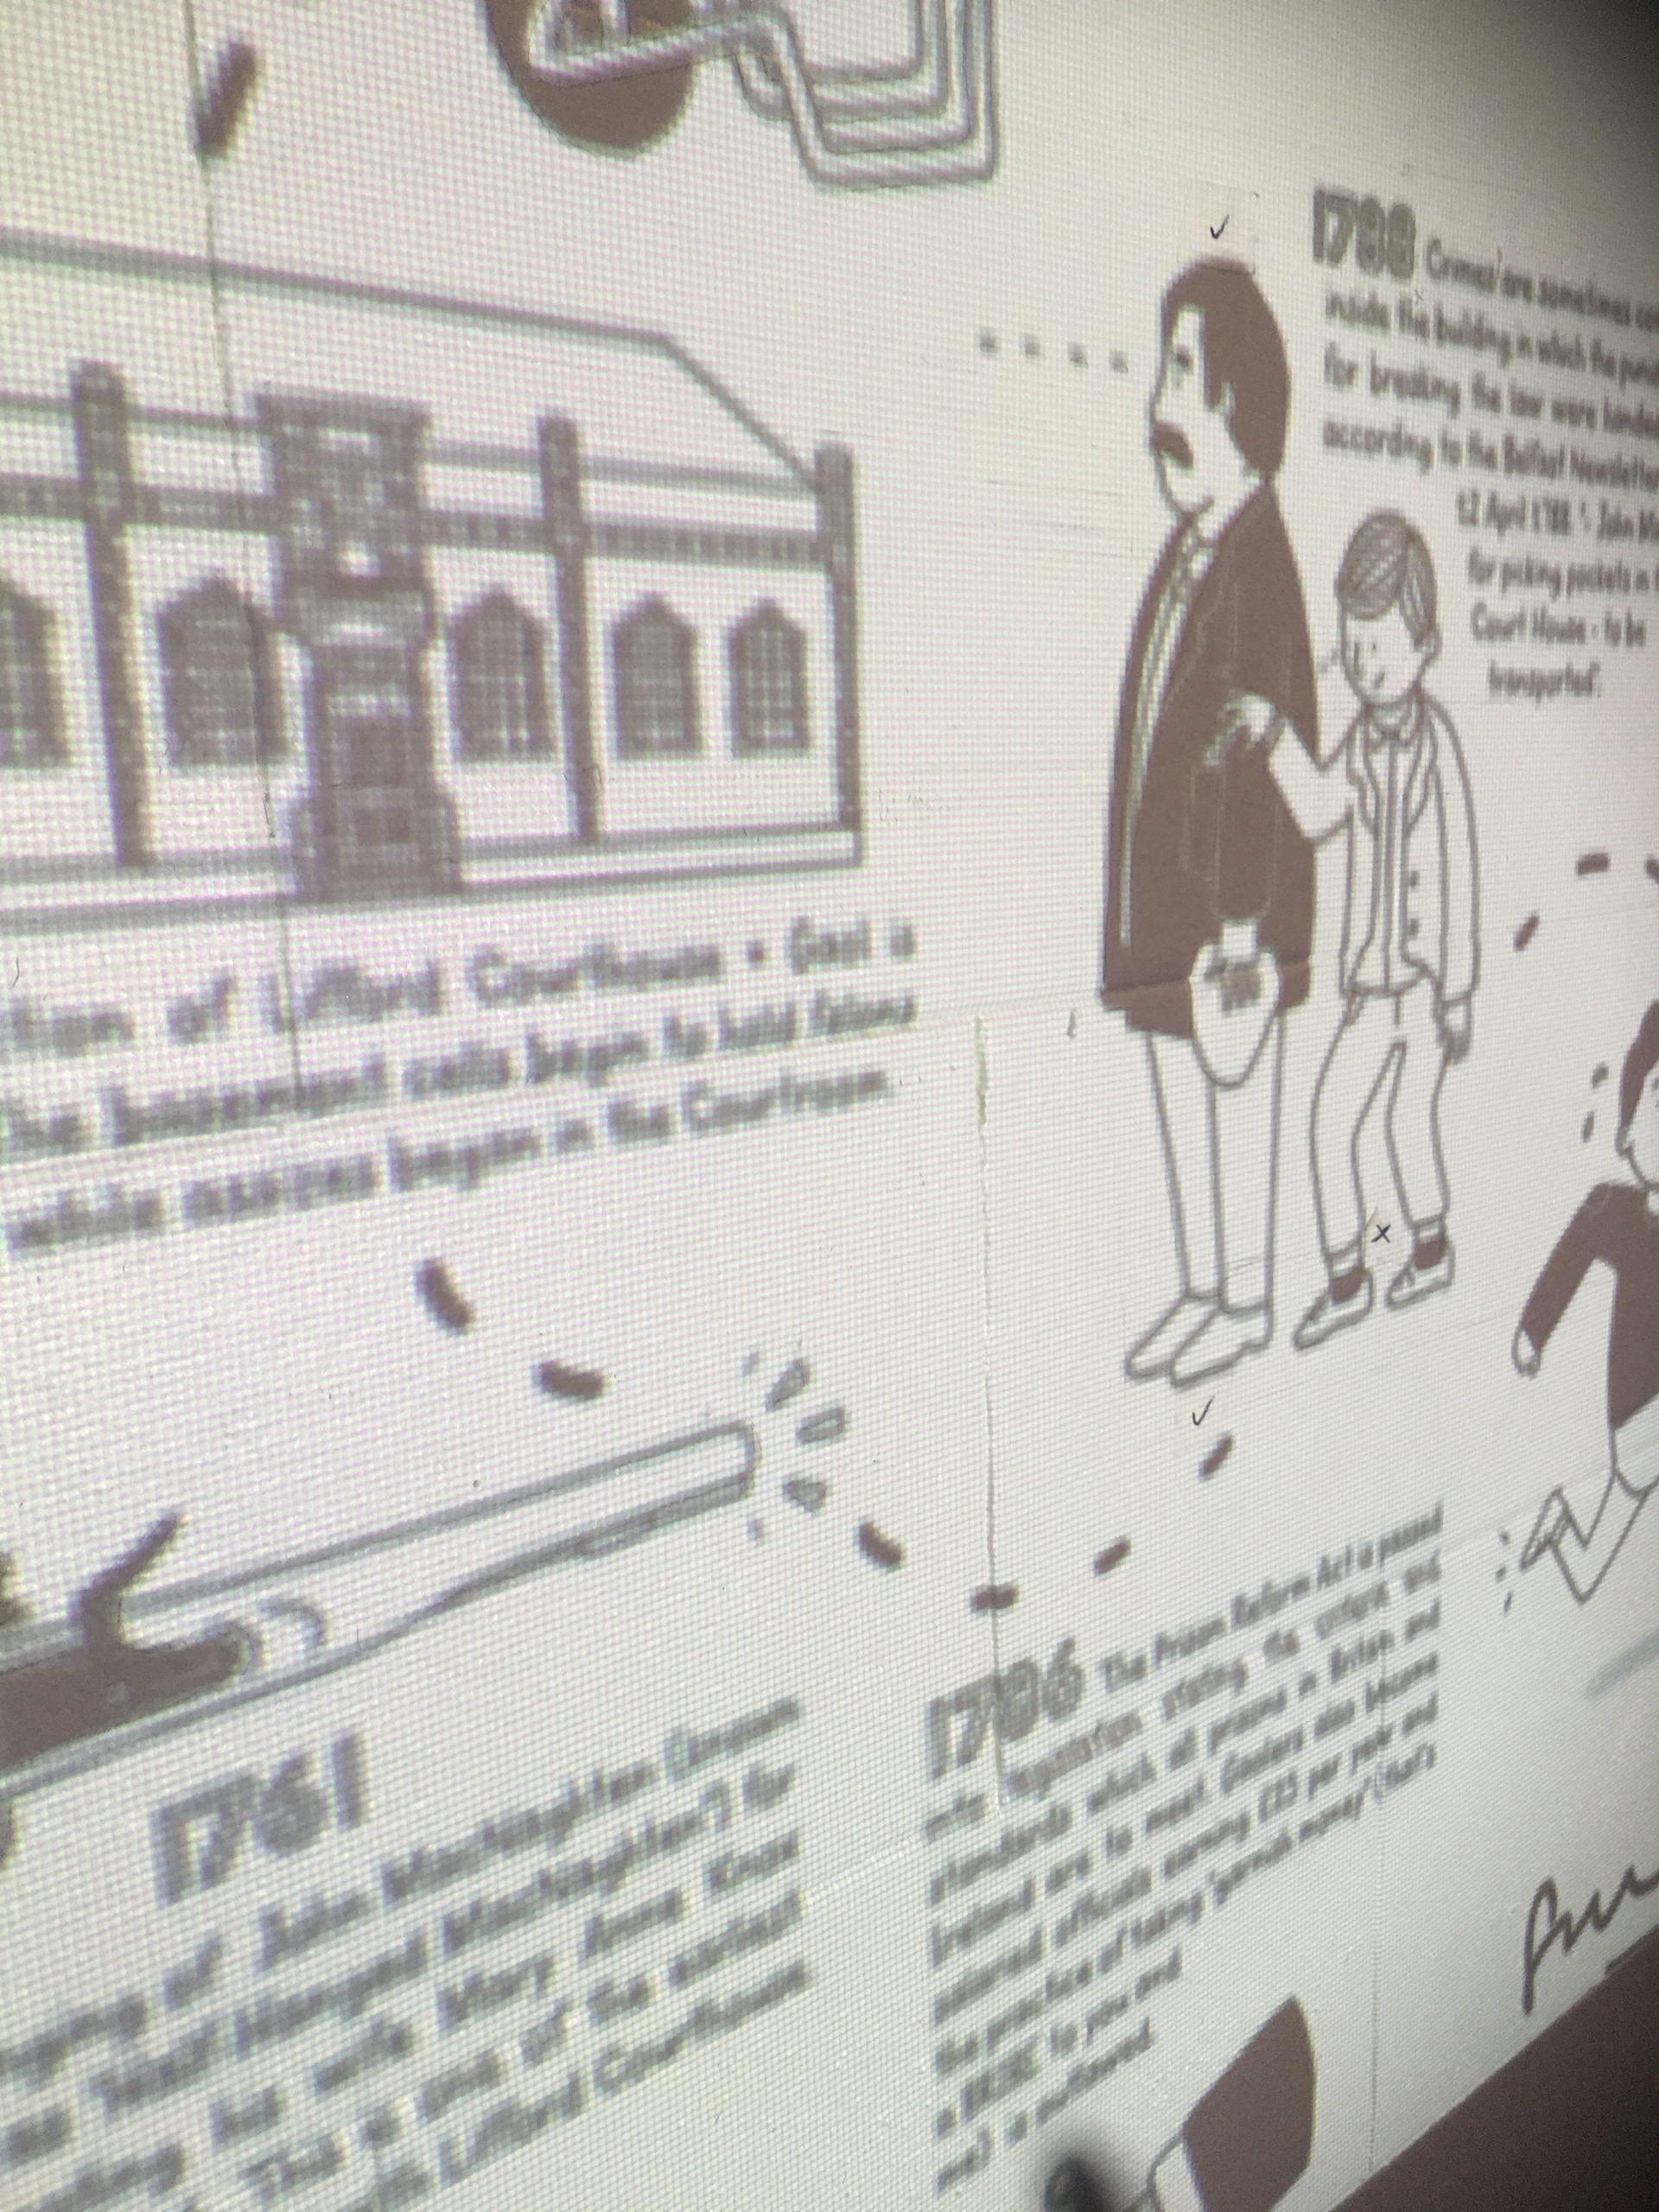 mural-childrens-history-illustration-ruth-graham-design-illustrator-ireland